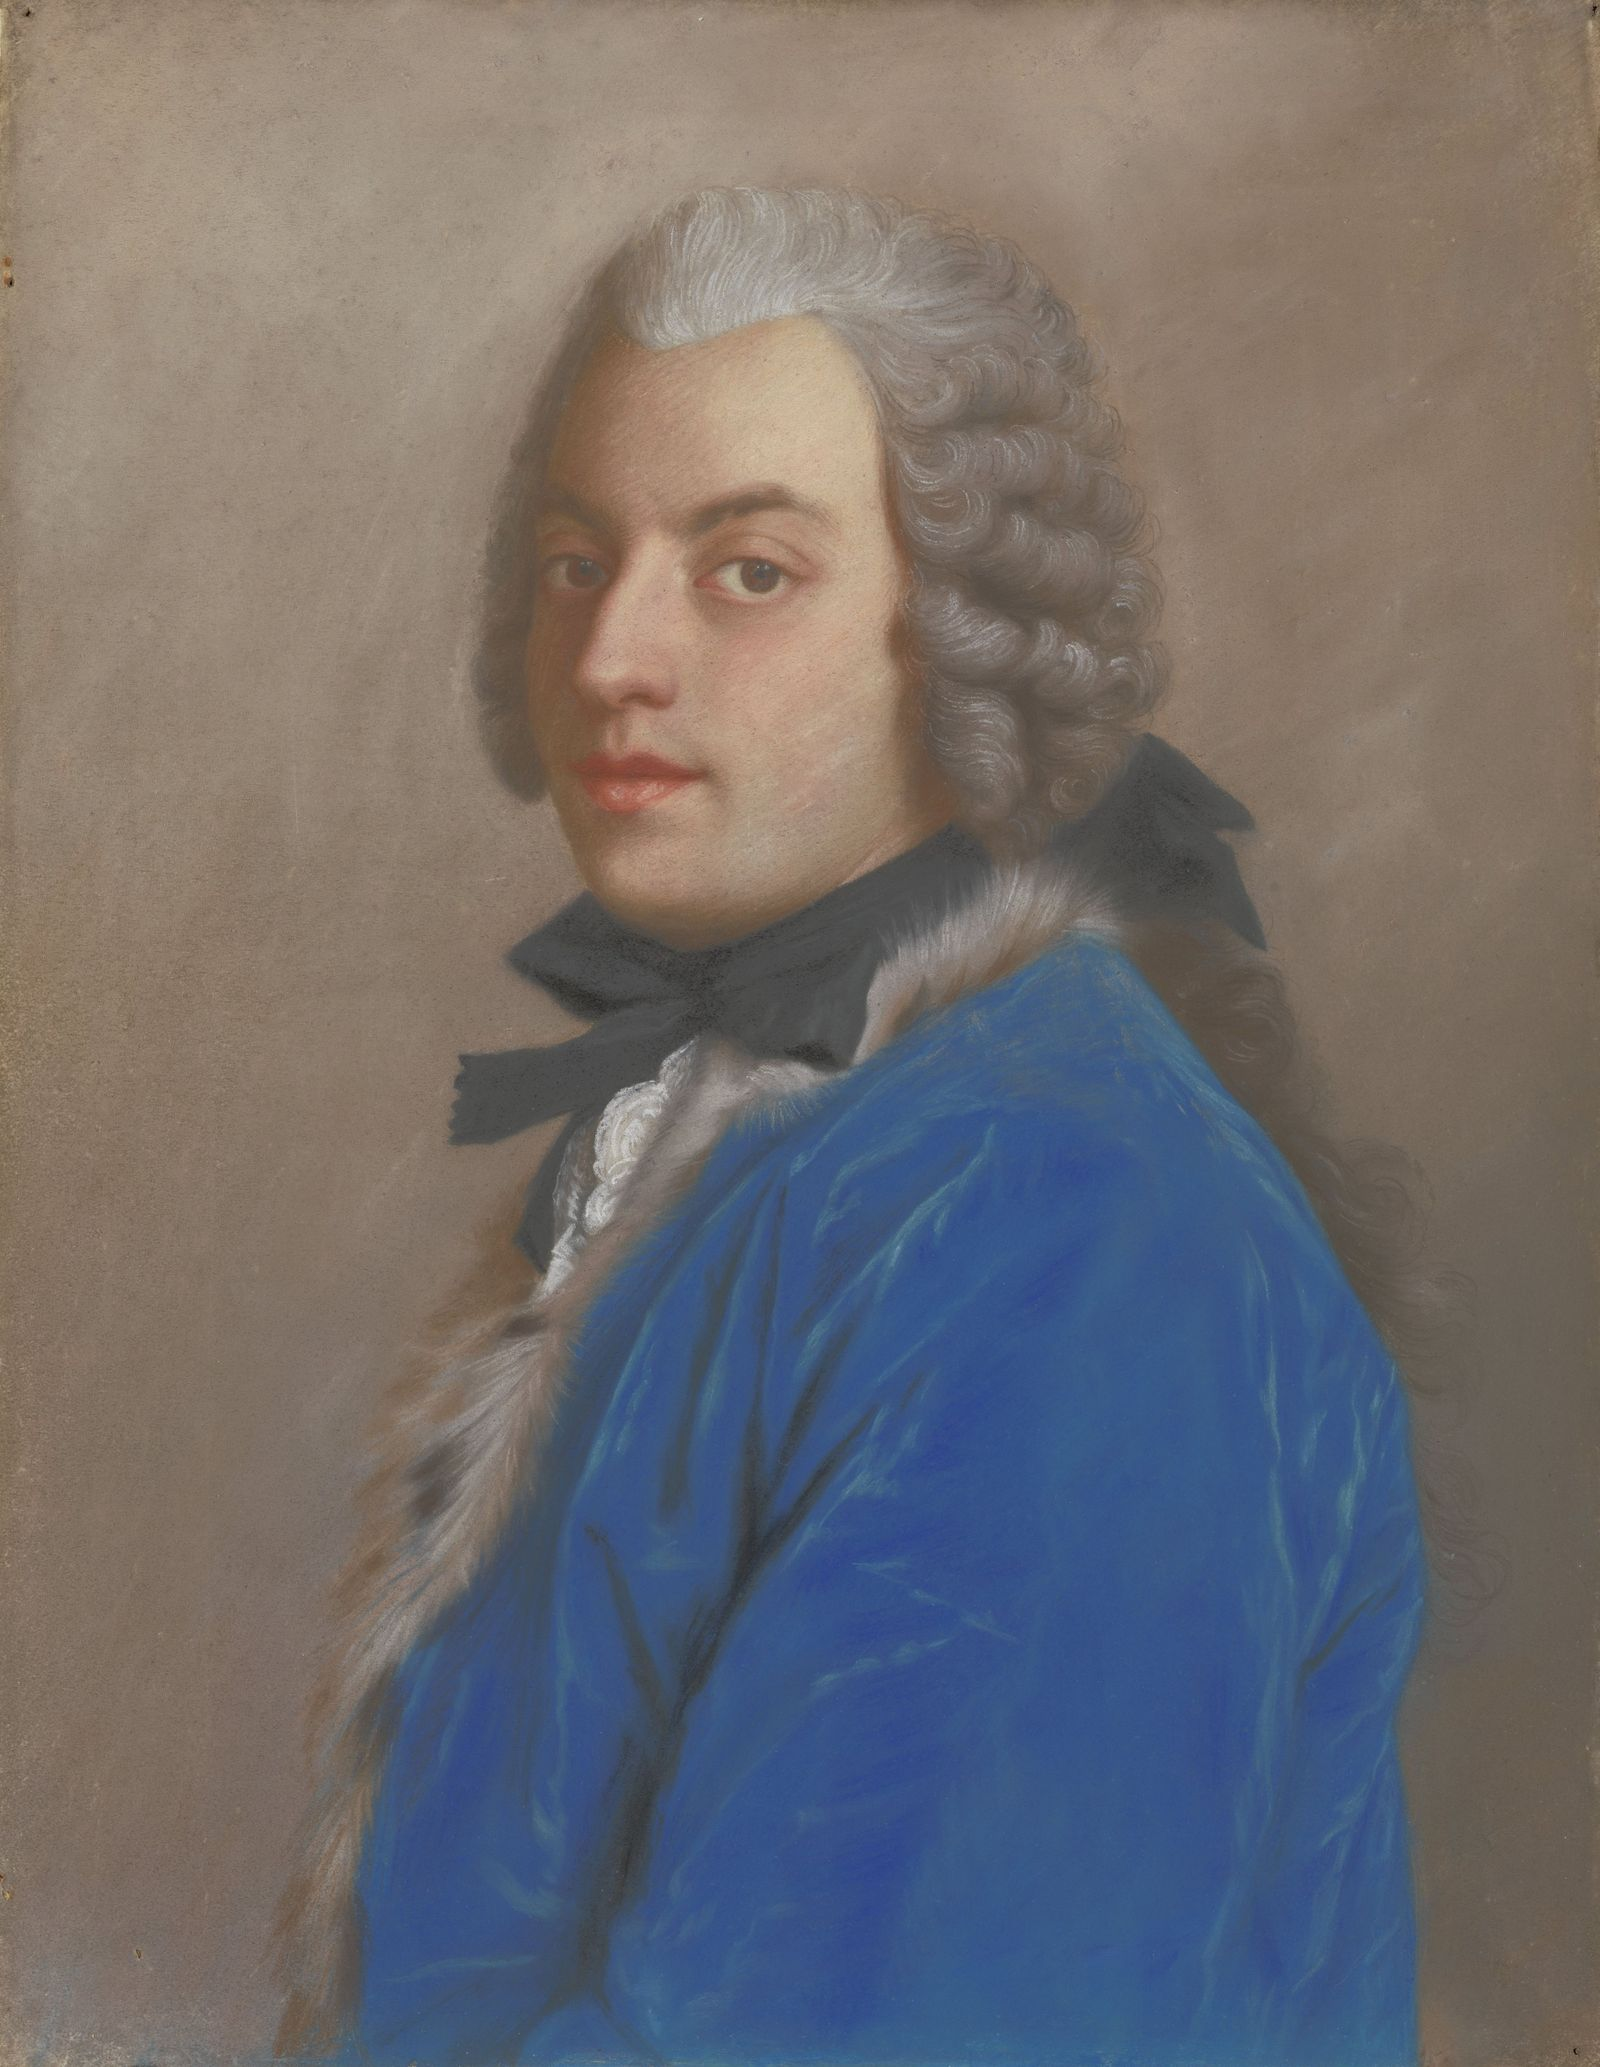 Count Francesco Algarotti Count Francesco Algarotti Portrait of Count Francesco Algarotti, Portrait of Count Francesco A